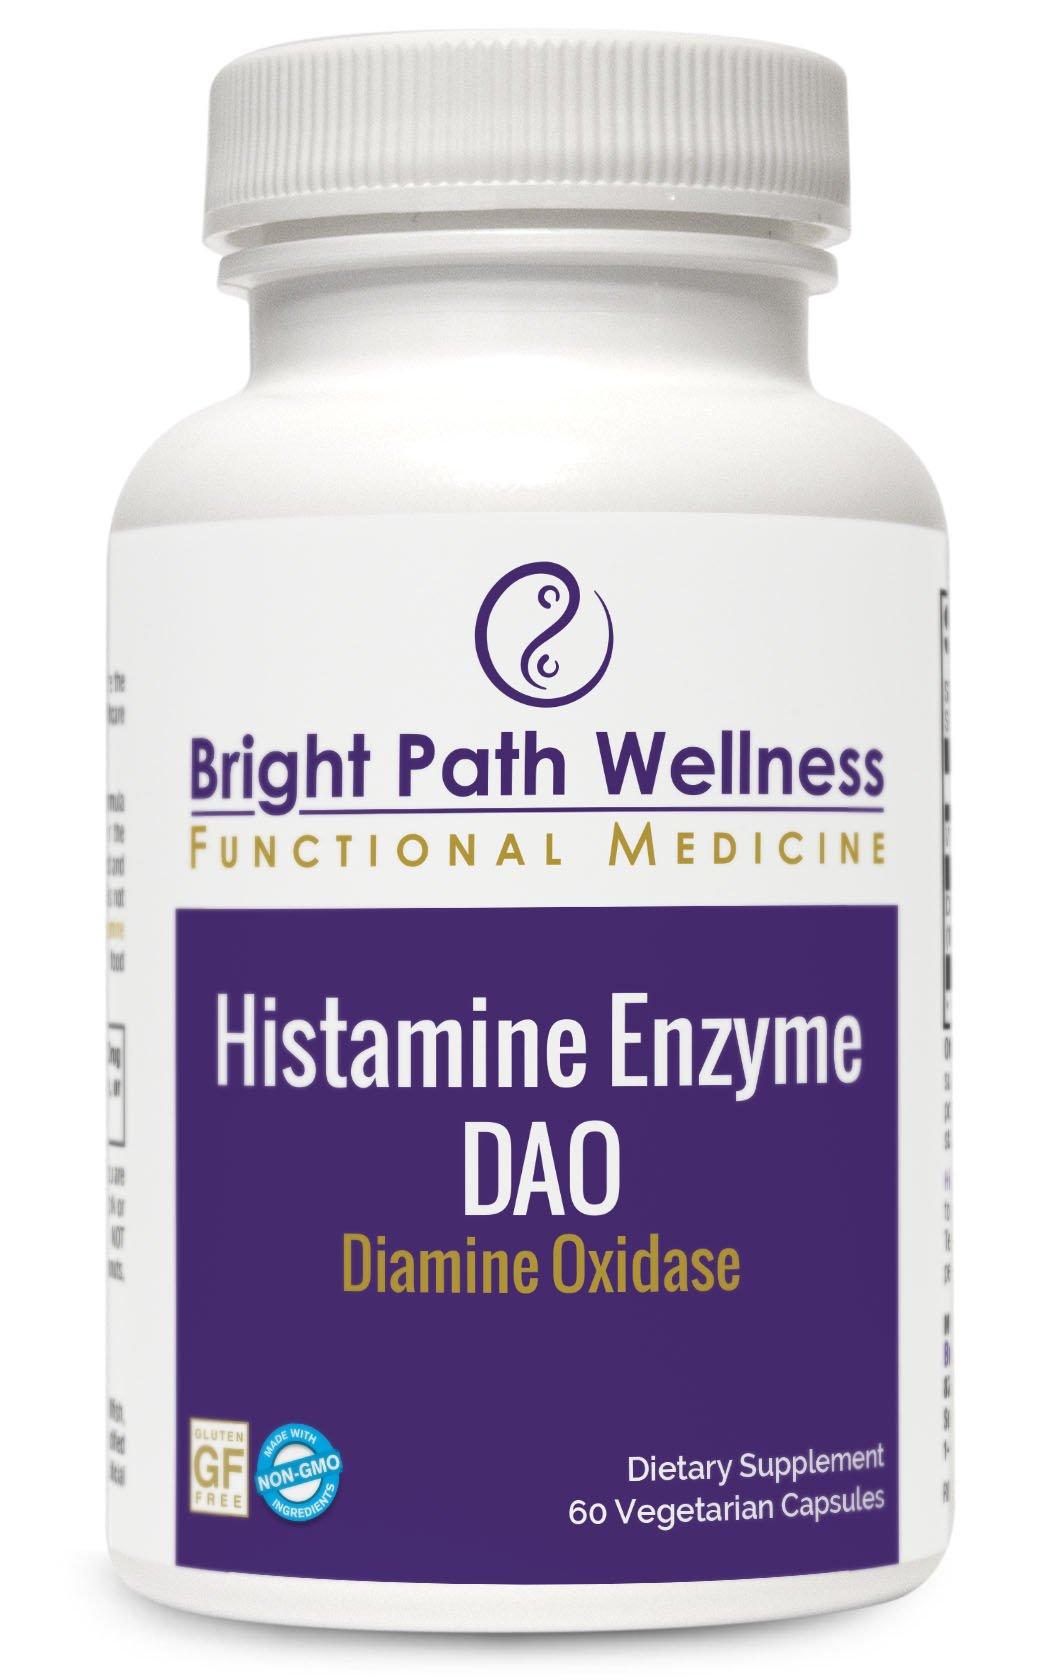 Histamine Enzyme - Diamine Oxidase - 60 Vegetable Capsules - 30 Servings - Non-GMO, Gluten Free